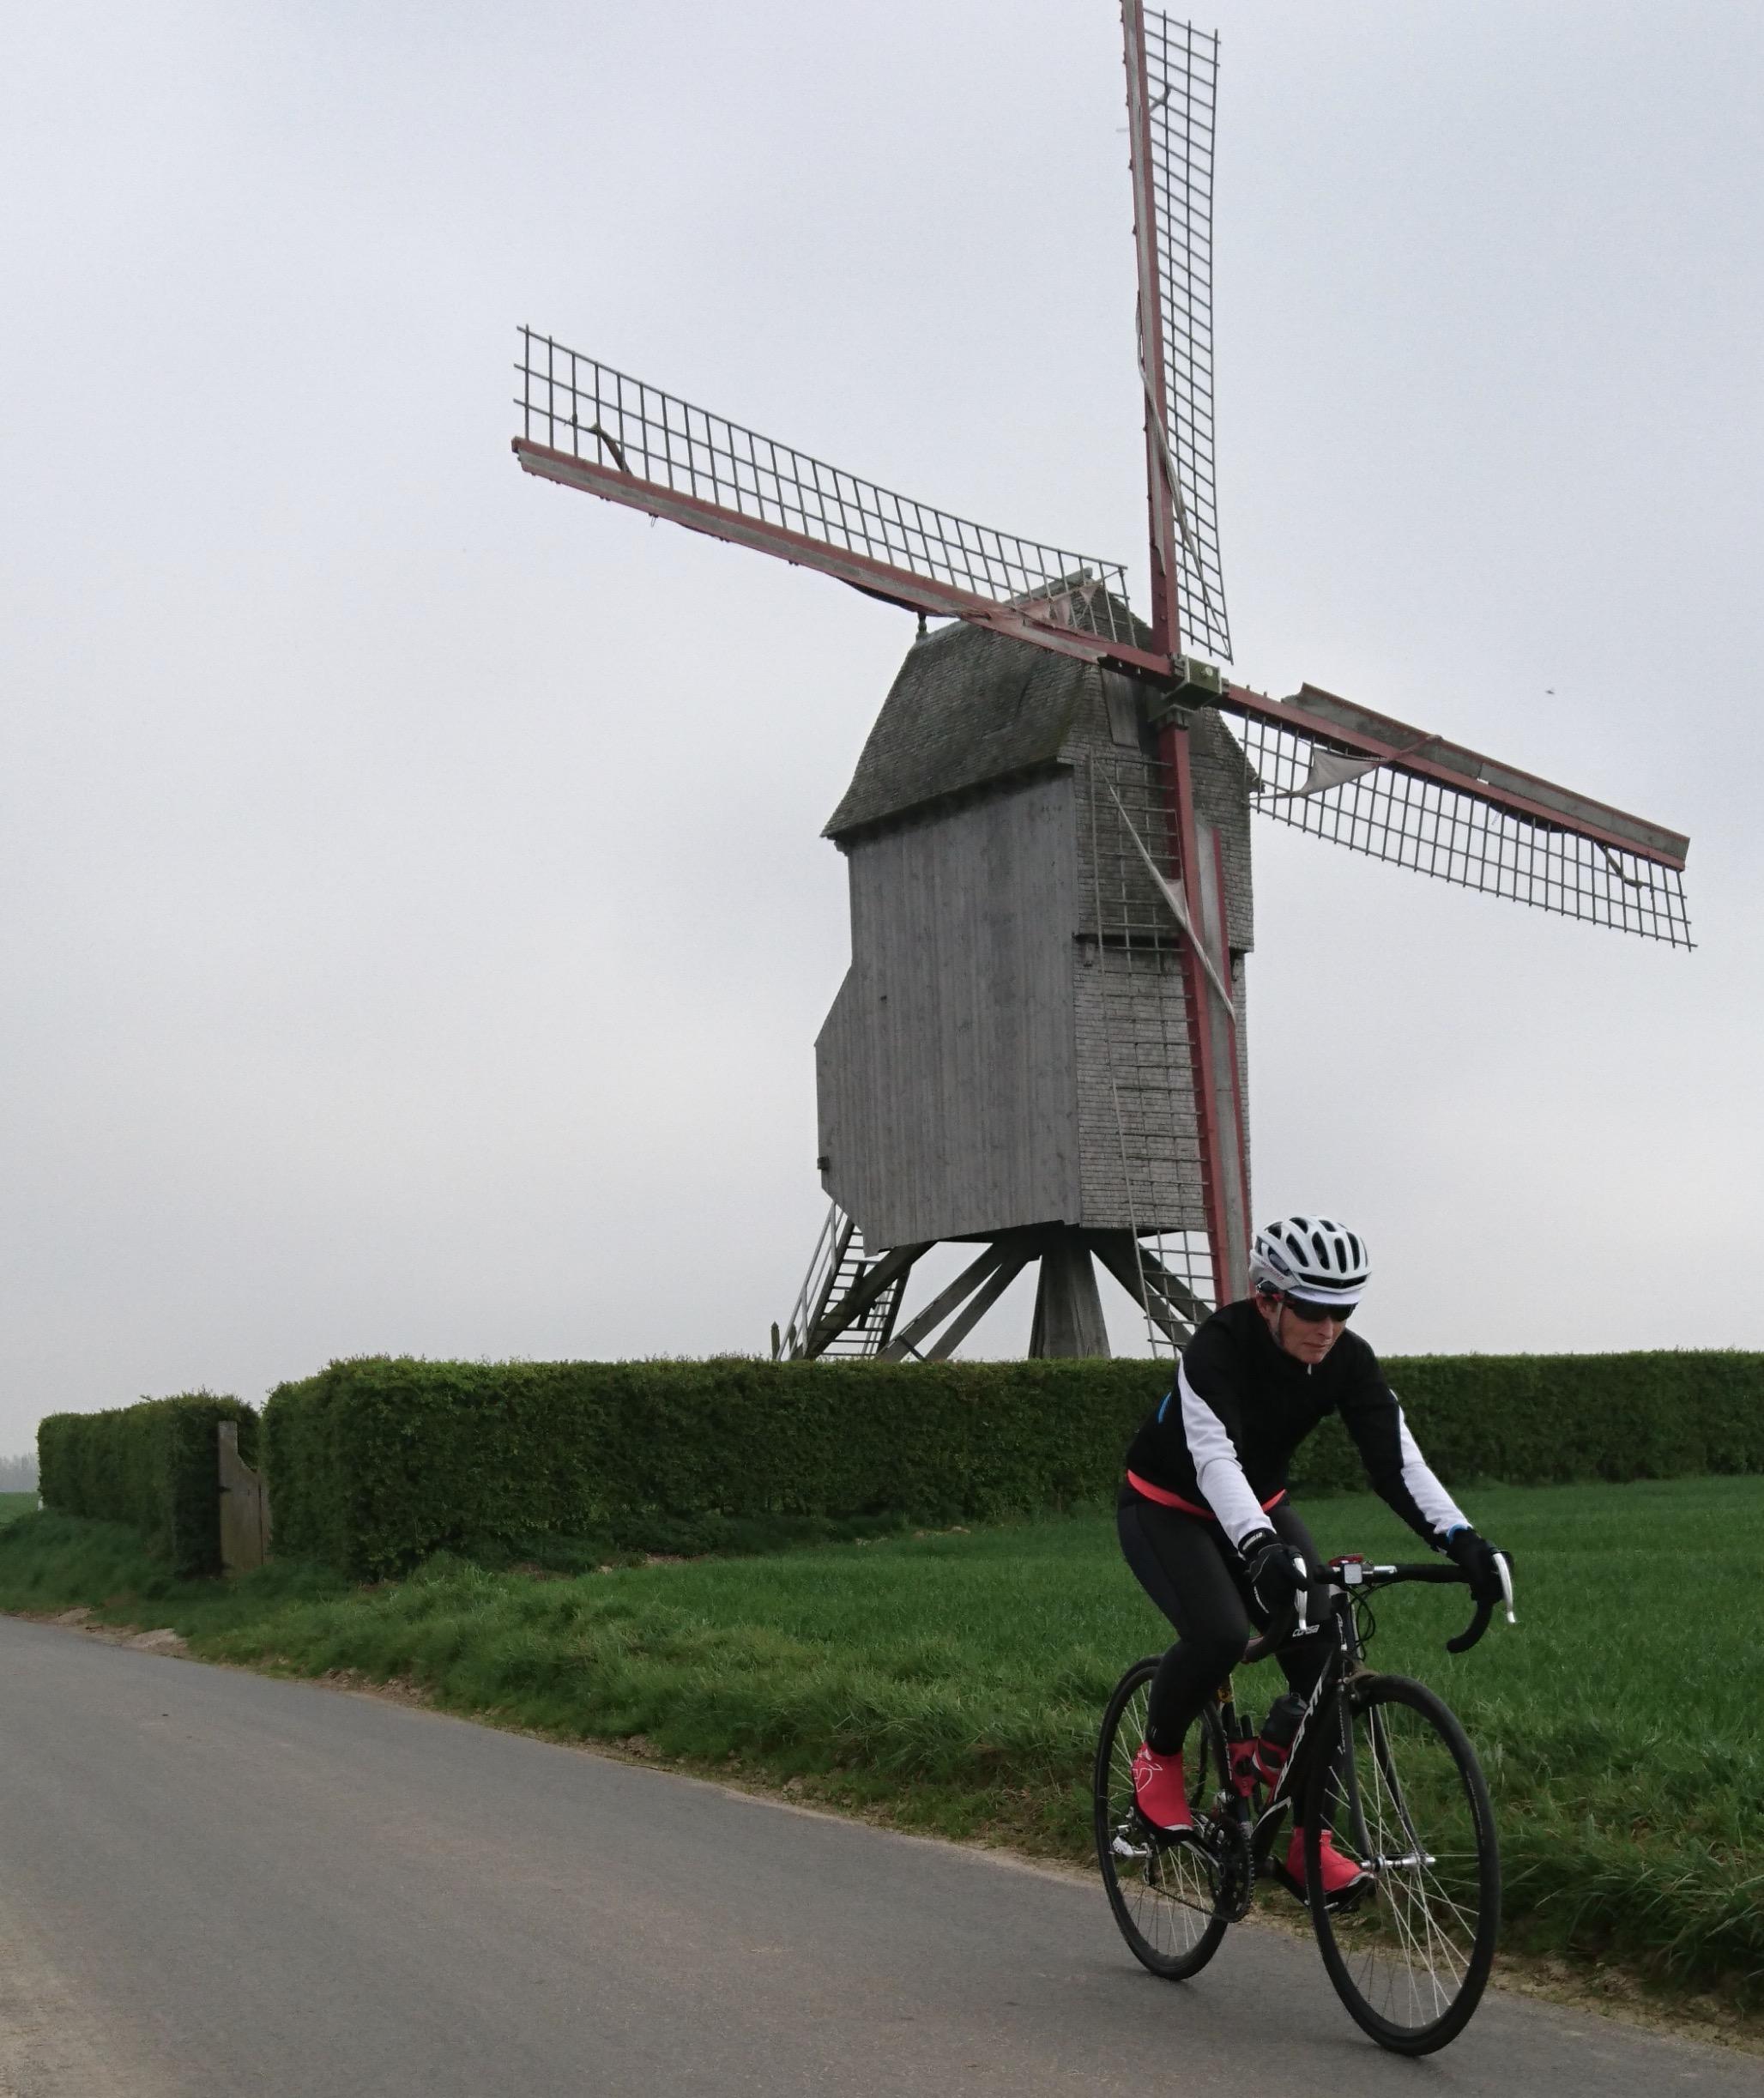 Ronde Van Vlaanderen 17 - the day after the Ronde it was time for Sue & Graham Tierney to get (lost ?) around the Flemish laneways near Zottegem & Sint Blasius Boekel. The ride included the cobbled Paddestraat, Lippenhoevestraat, Holleweg & Haaghoek (all used in the Ronde)